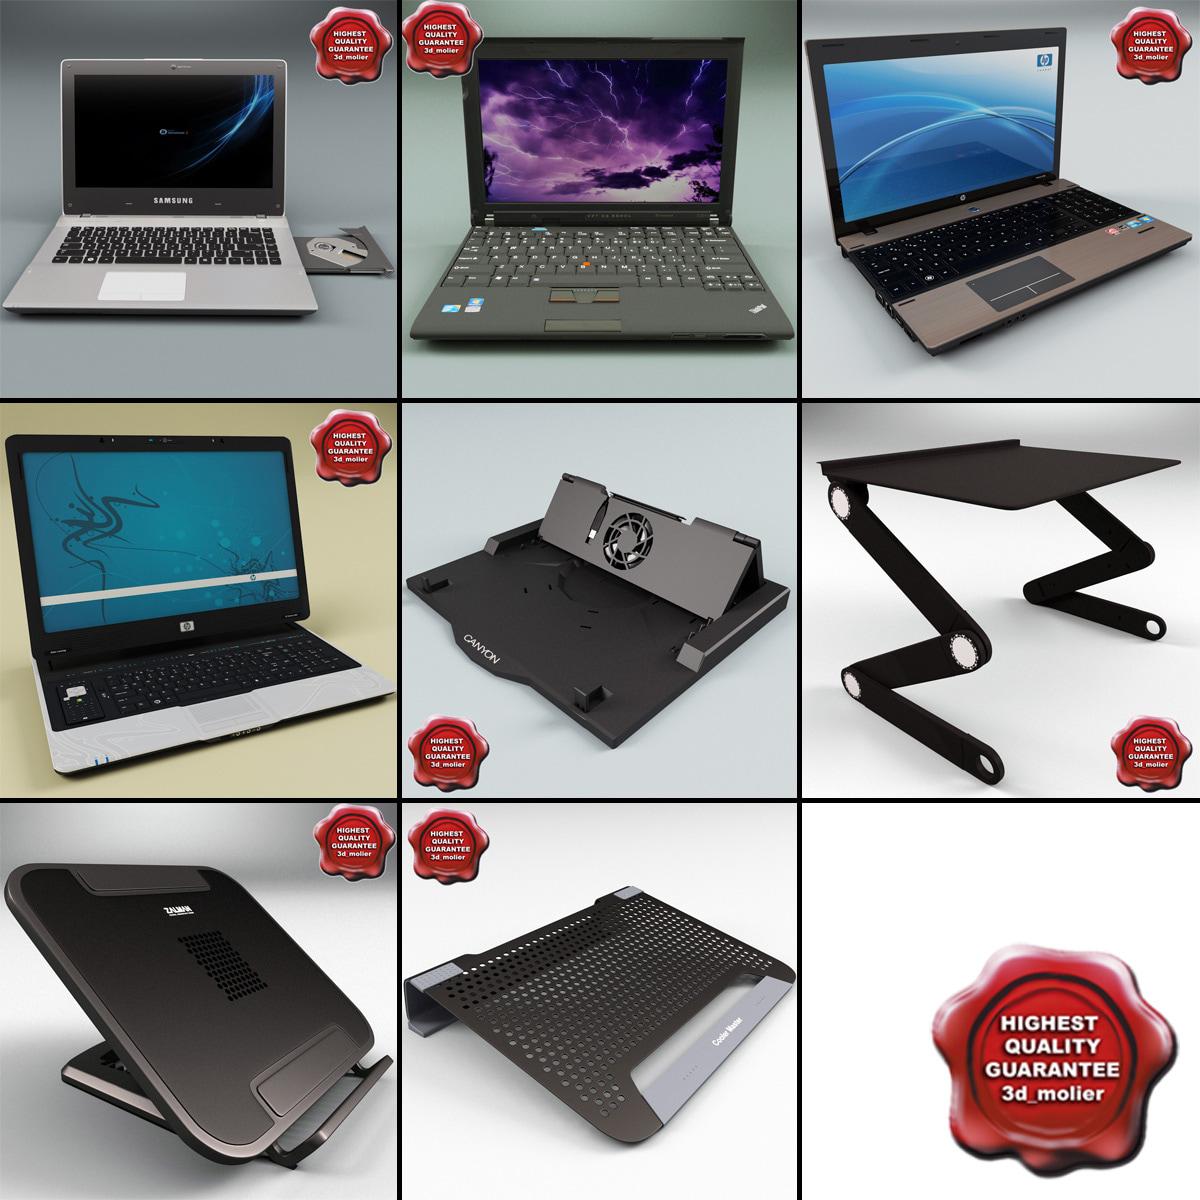 Laptops_Collection_V4_000.jpg